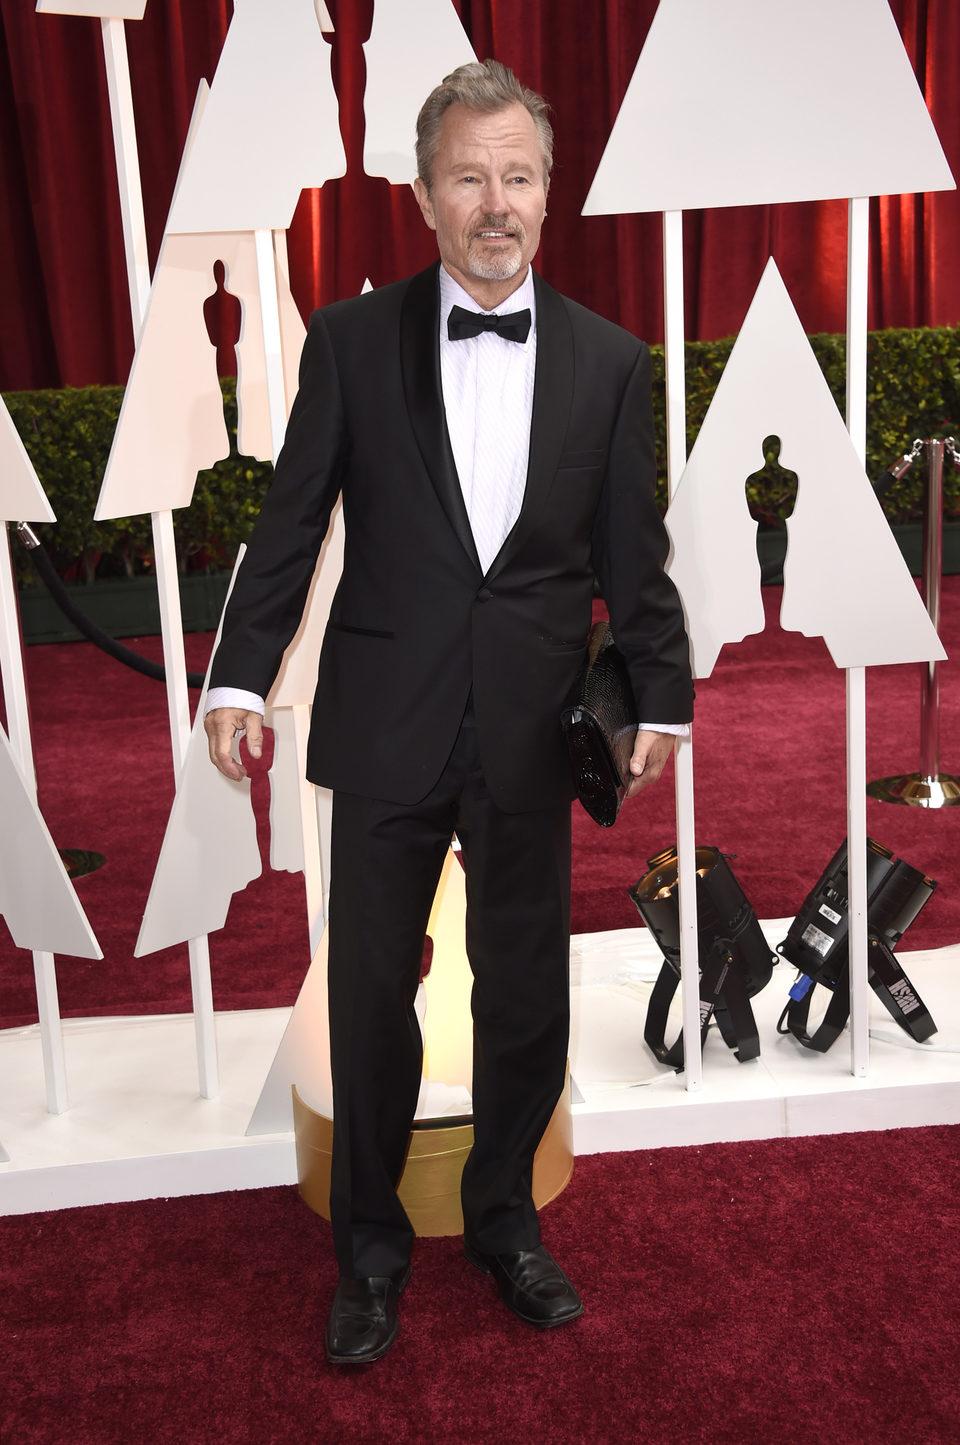 John Savage at the Oscars Awards 2015 red carpet